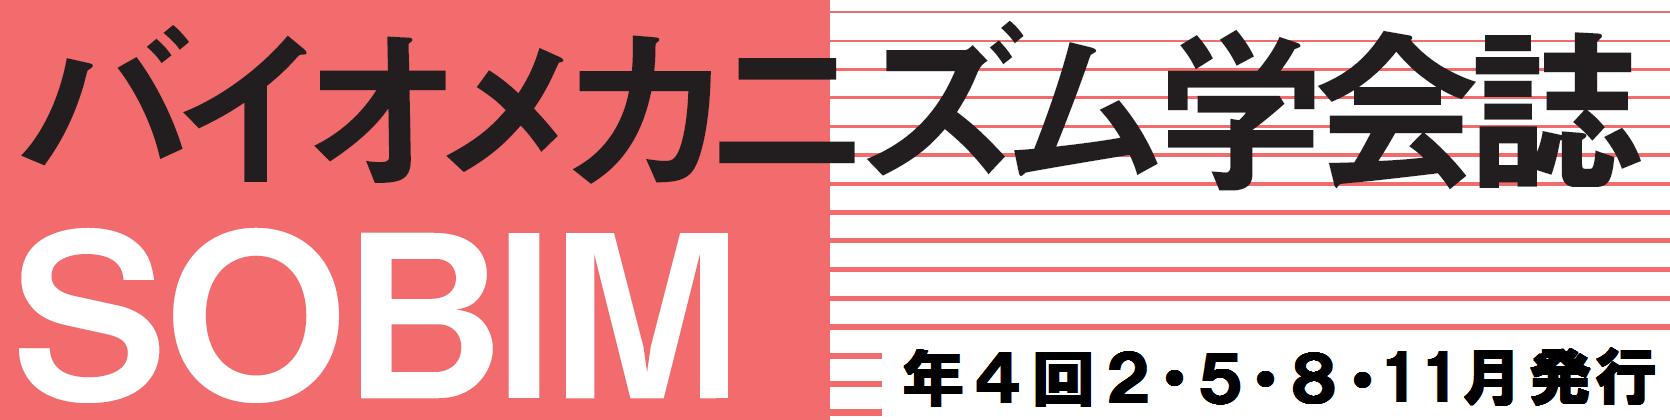 J-STAGEバイオメカニズム学会誌